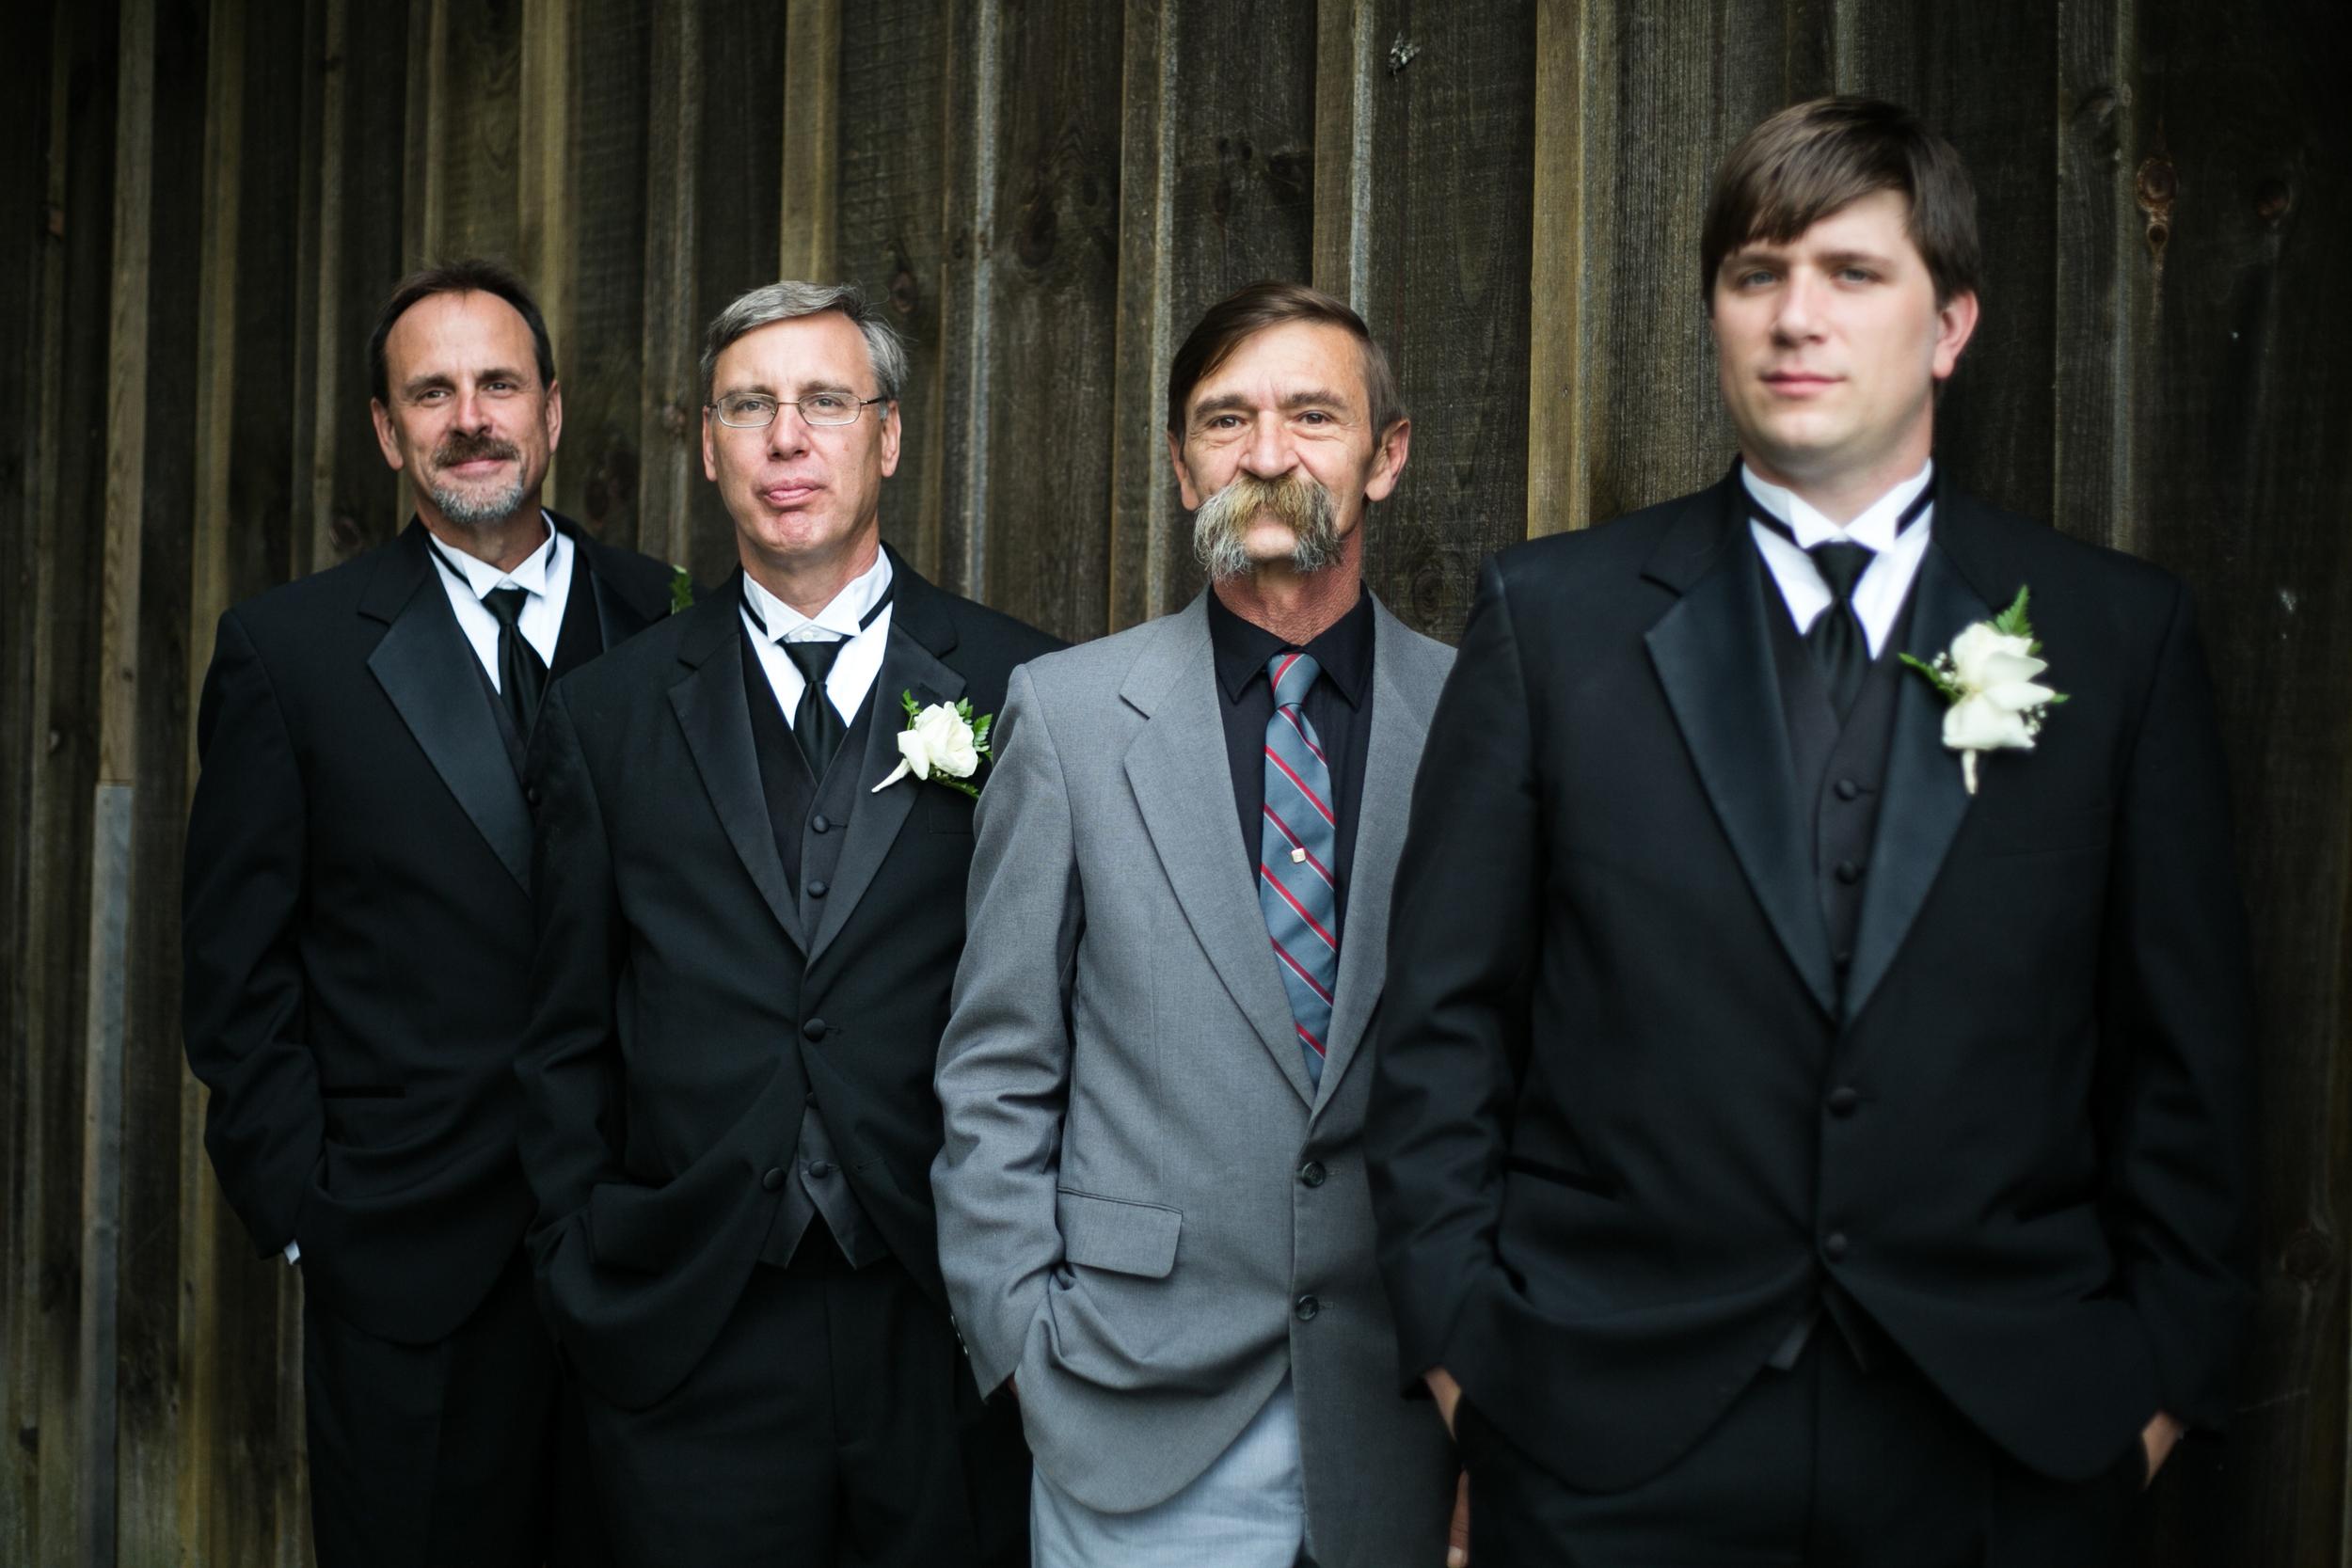 mary-brad-sizemore-wedding-naylor-vineyard-living-radiant-photography-2014-741.jpg